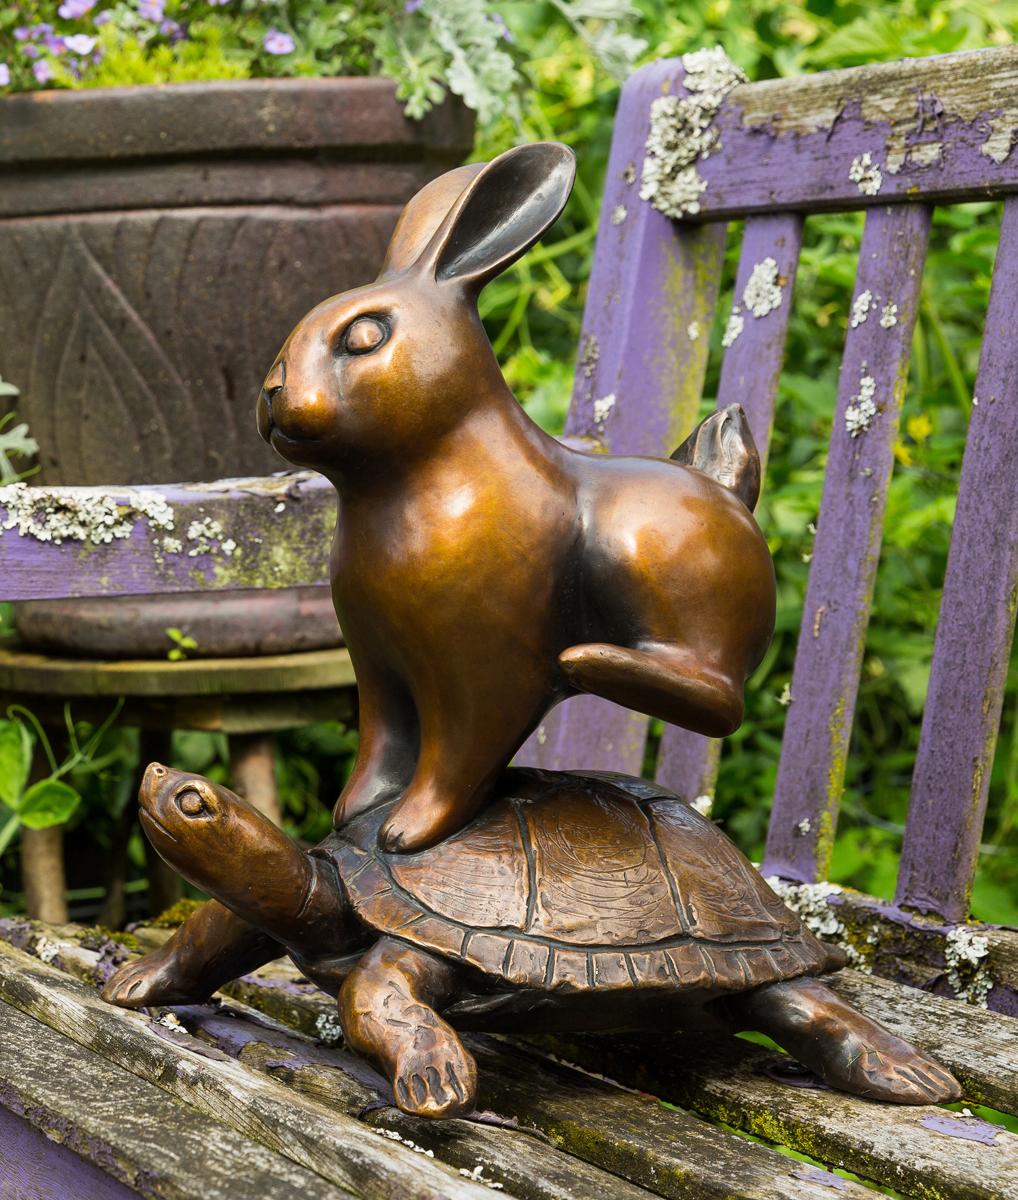 Turtle and Rabbit